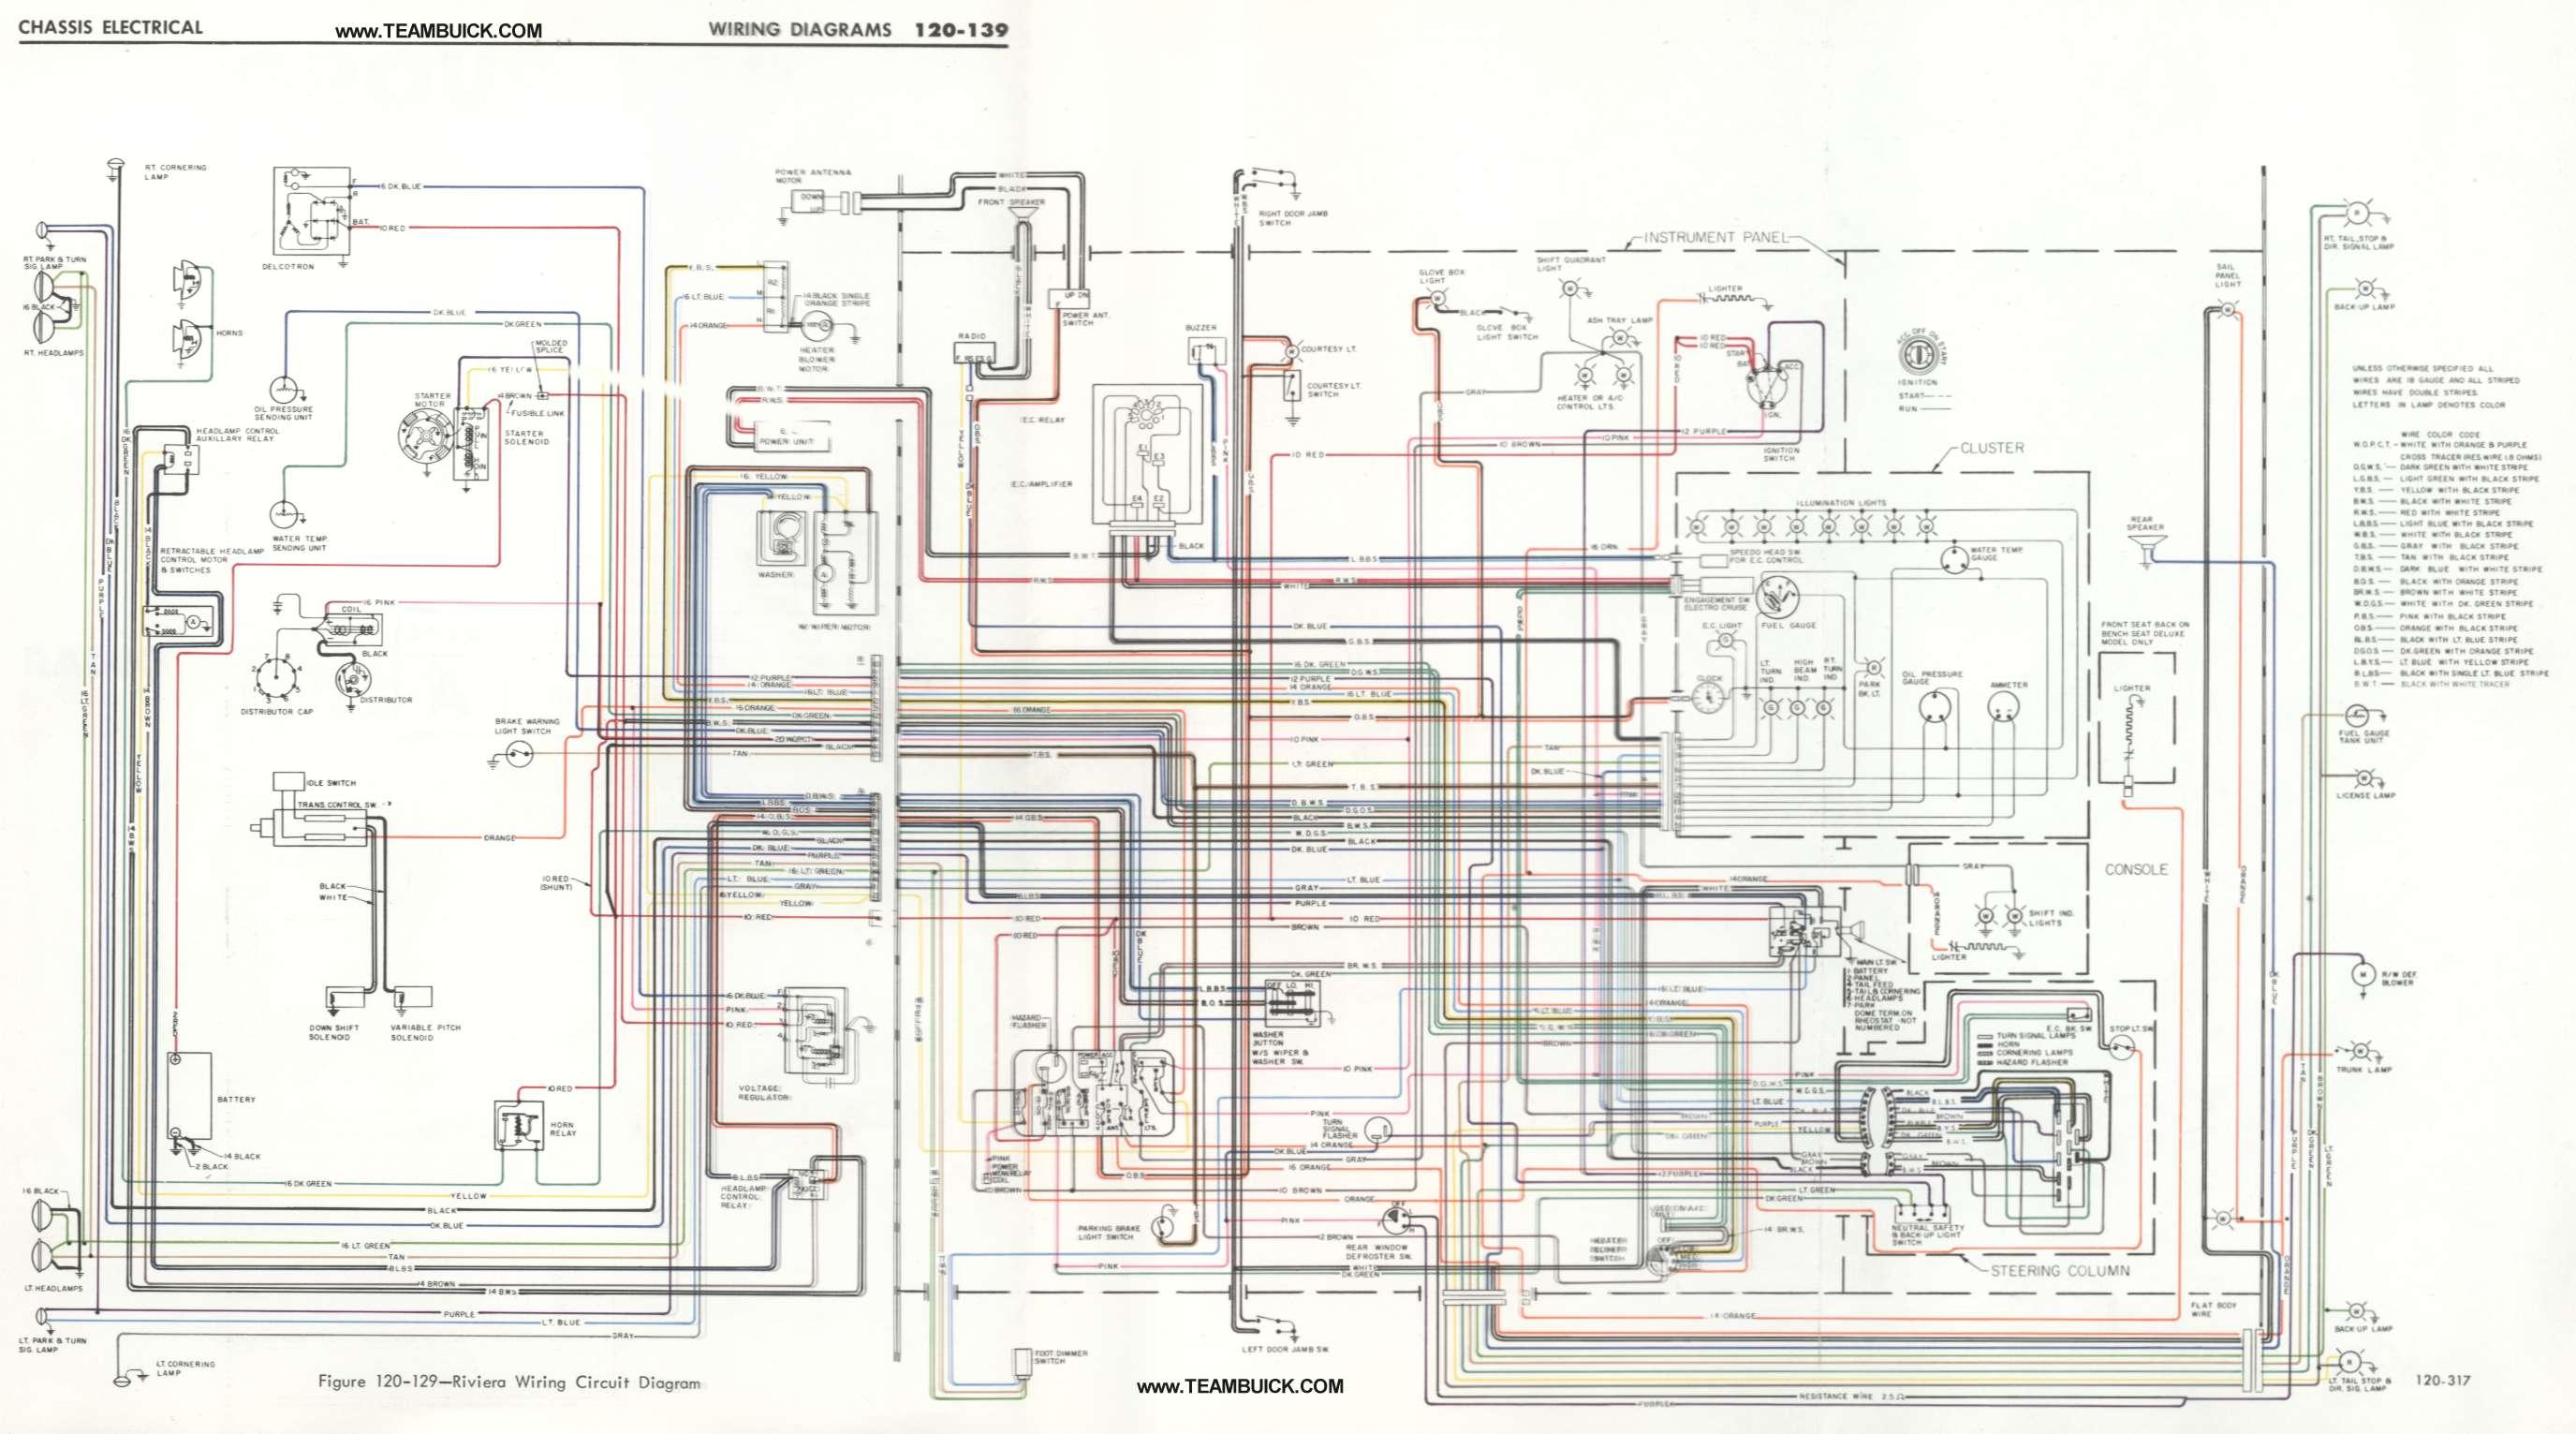 1977 Ford Ranchero Wiring Diagram 1967 Buick Riviera Wiring Diagram